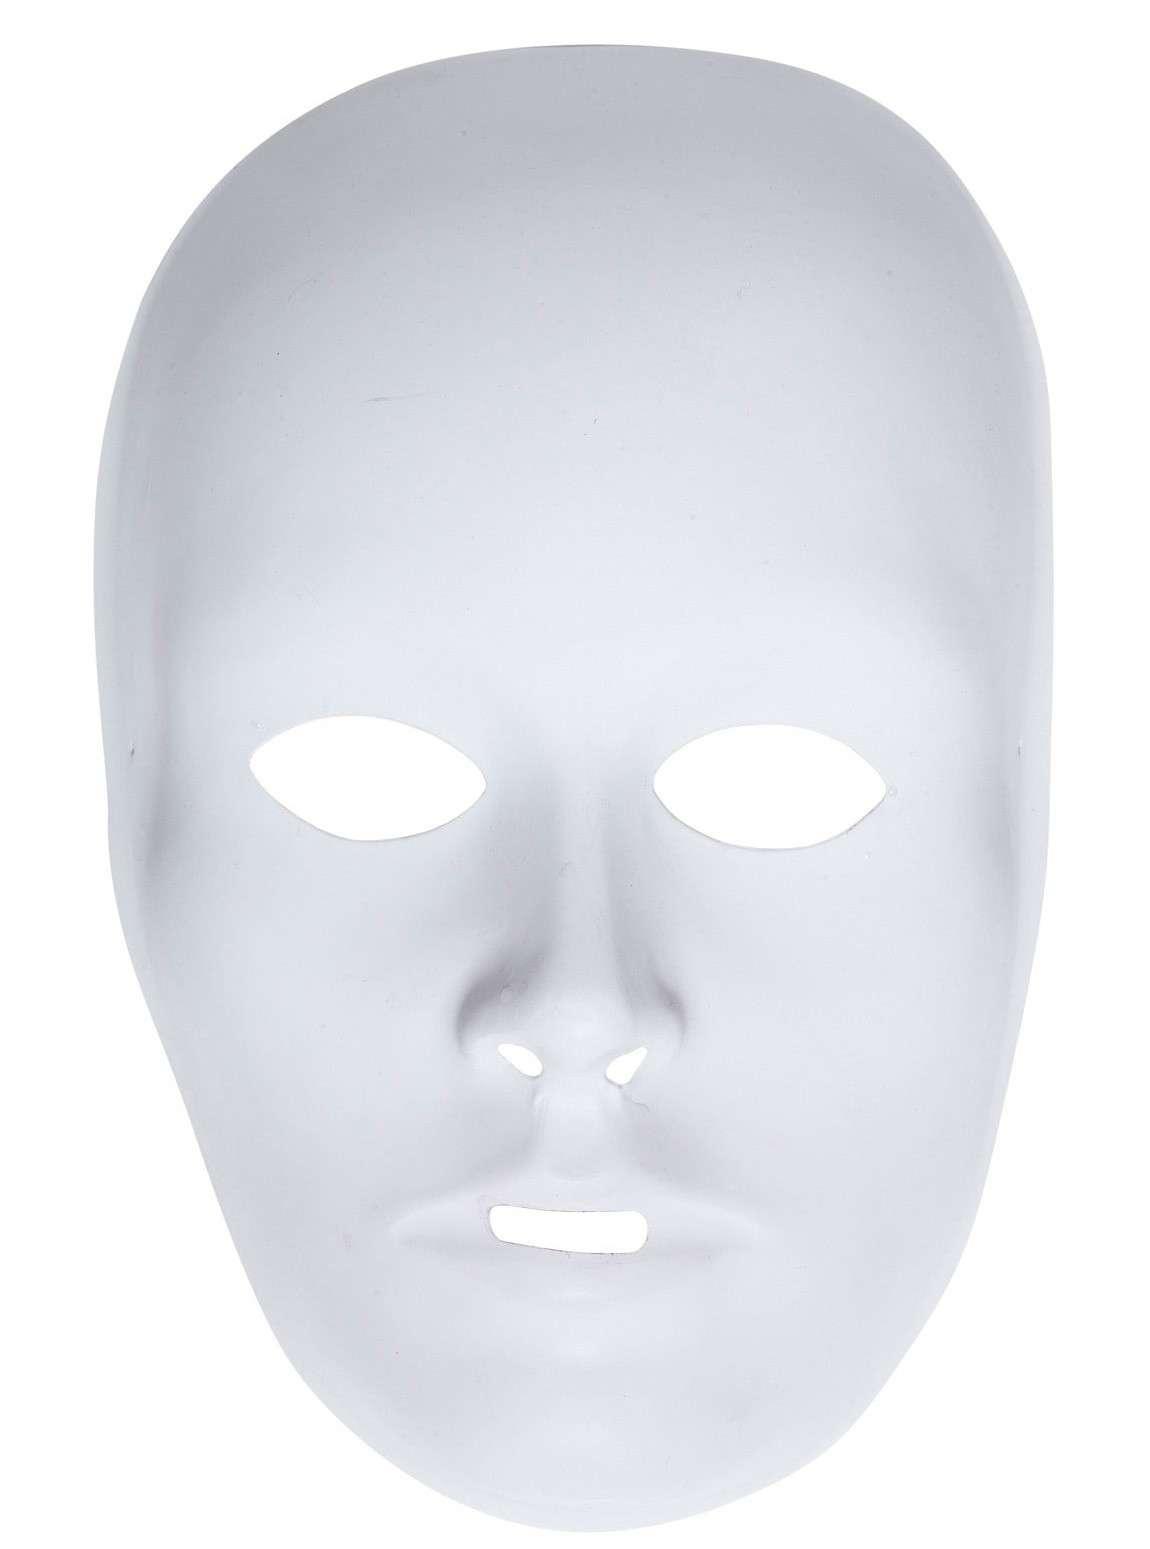 bemalbare weisse maske 1 1280x1280 2x